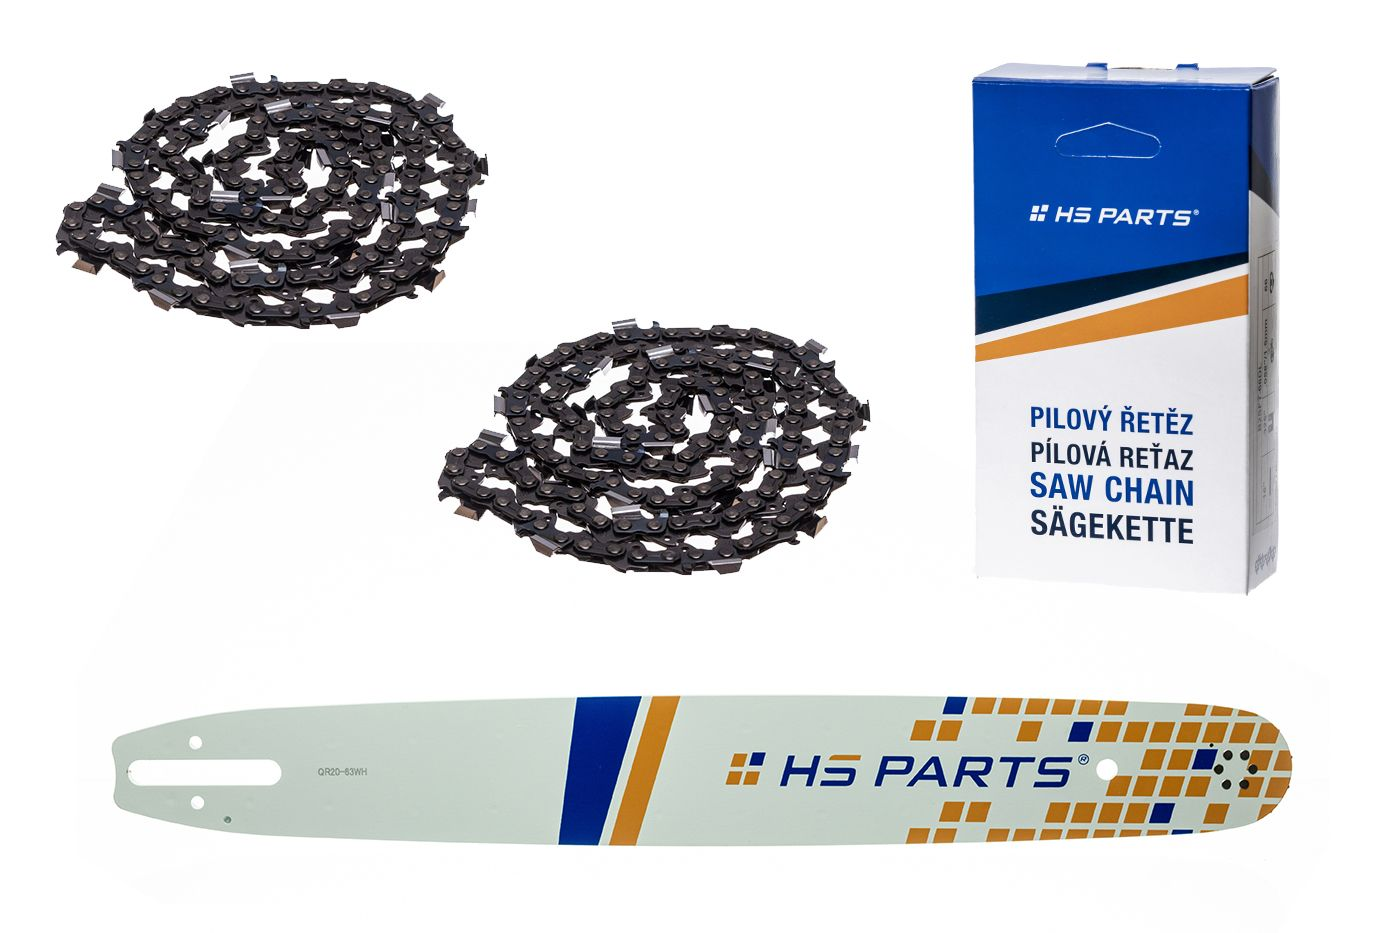 "HS PARTS Vodiaca lišta 20"" (50 cm) + 2x pílový reťaz .325"" .063"" (1,6 mm) 81 čl."